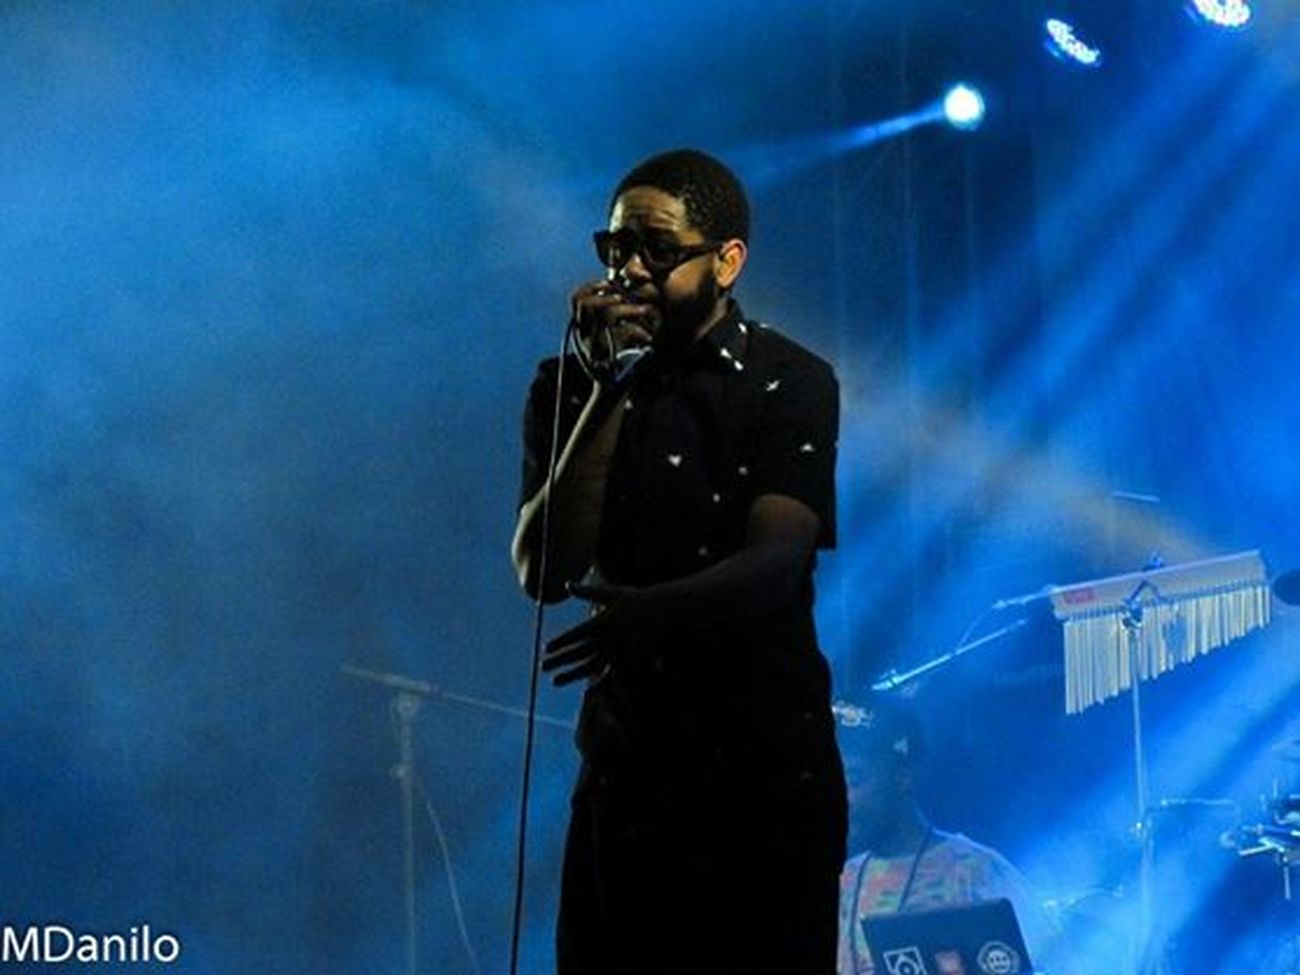 O grande Emicida em solo amapaense. Rapper Music Brasil